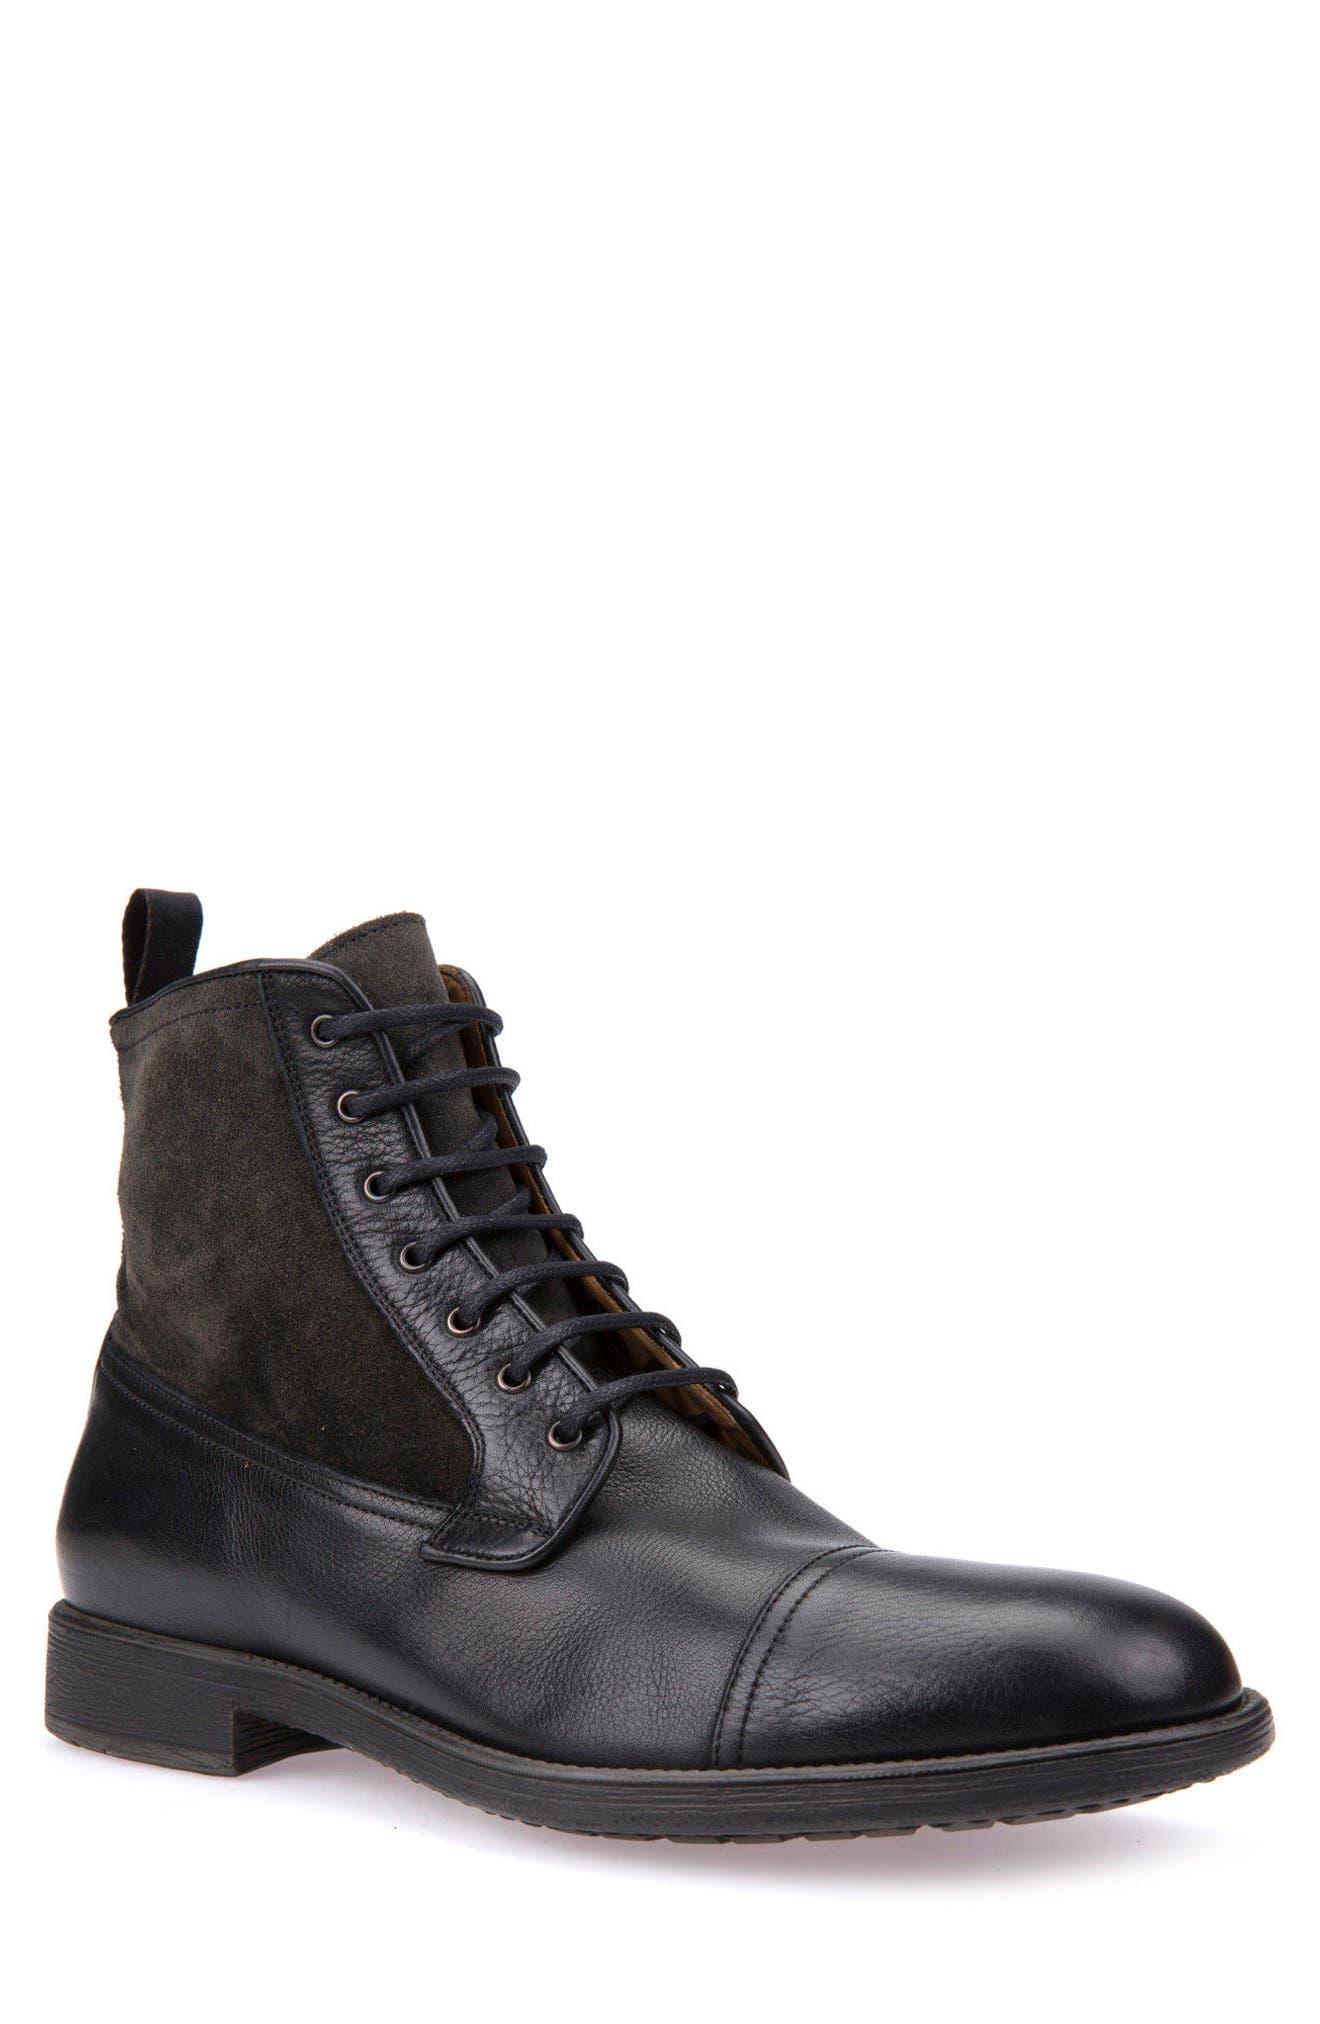 Jaylon 12 Cap-Toe Boot,                         Main,                         color, 001